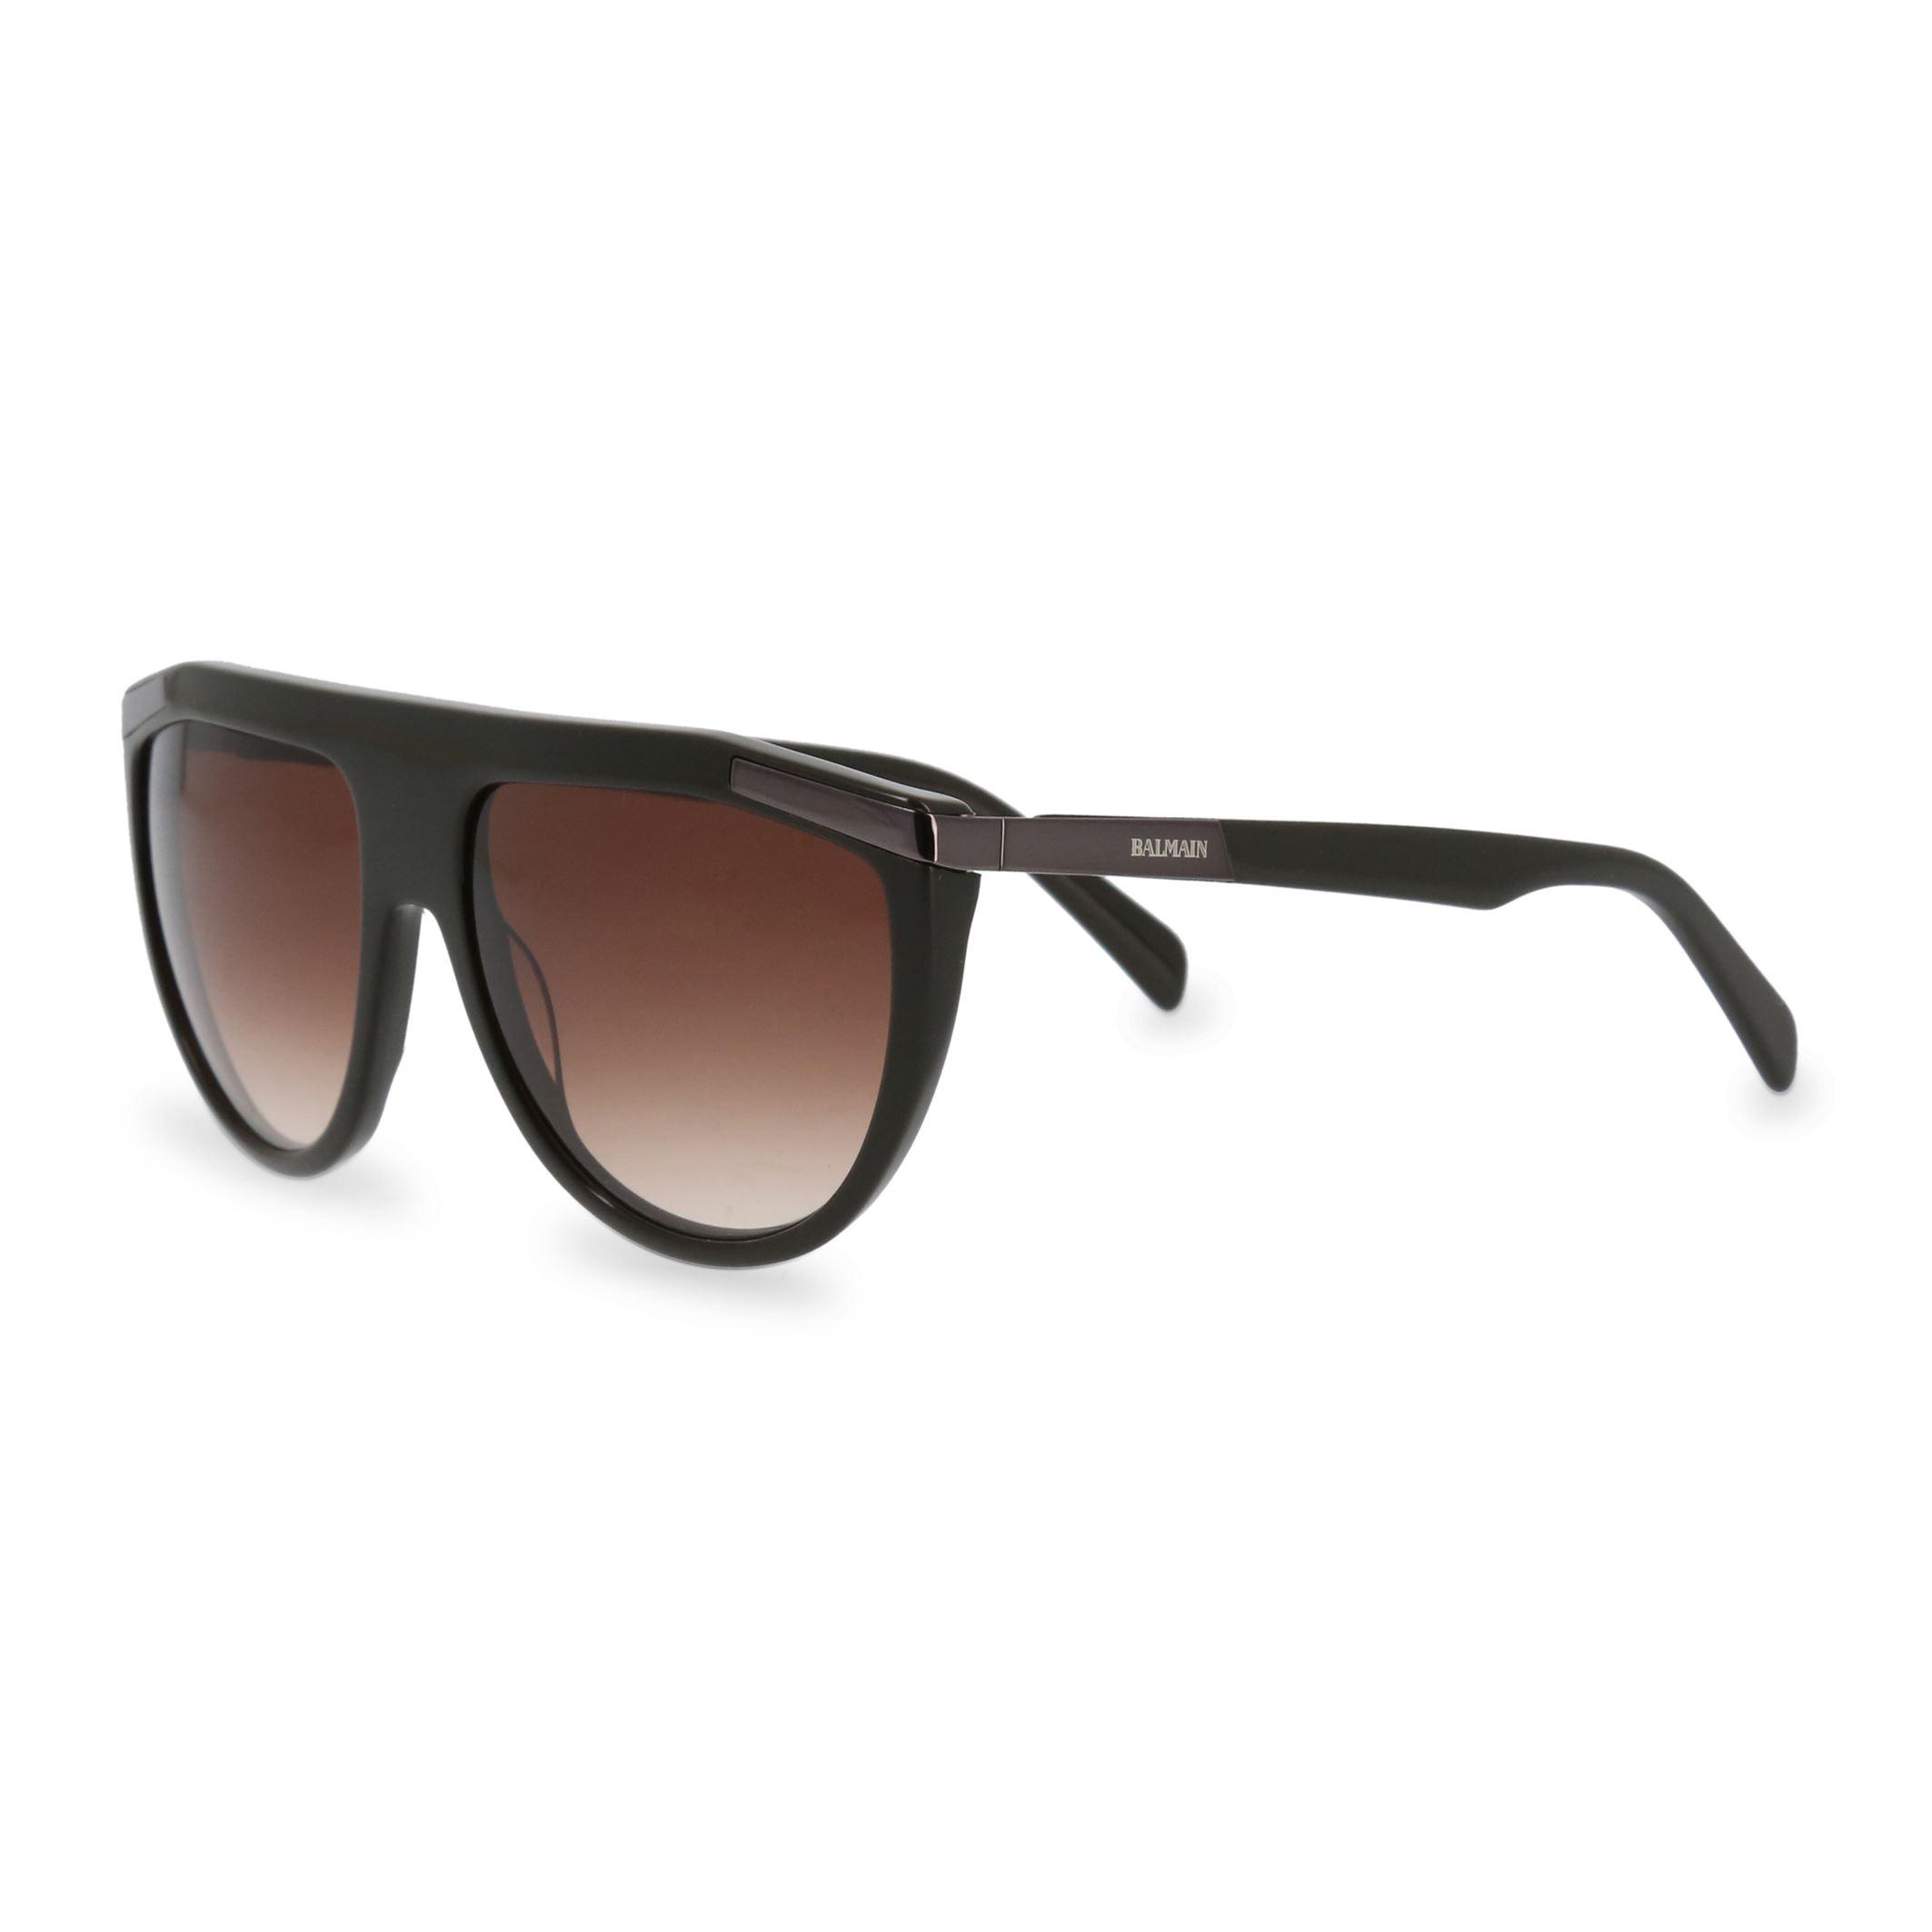 180aca52b Details about Balmain Unisex Sunglasses Brown Acetate Frame Gradient Lenses  UV2